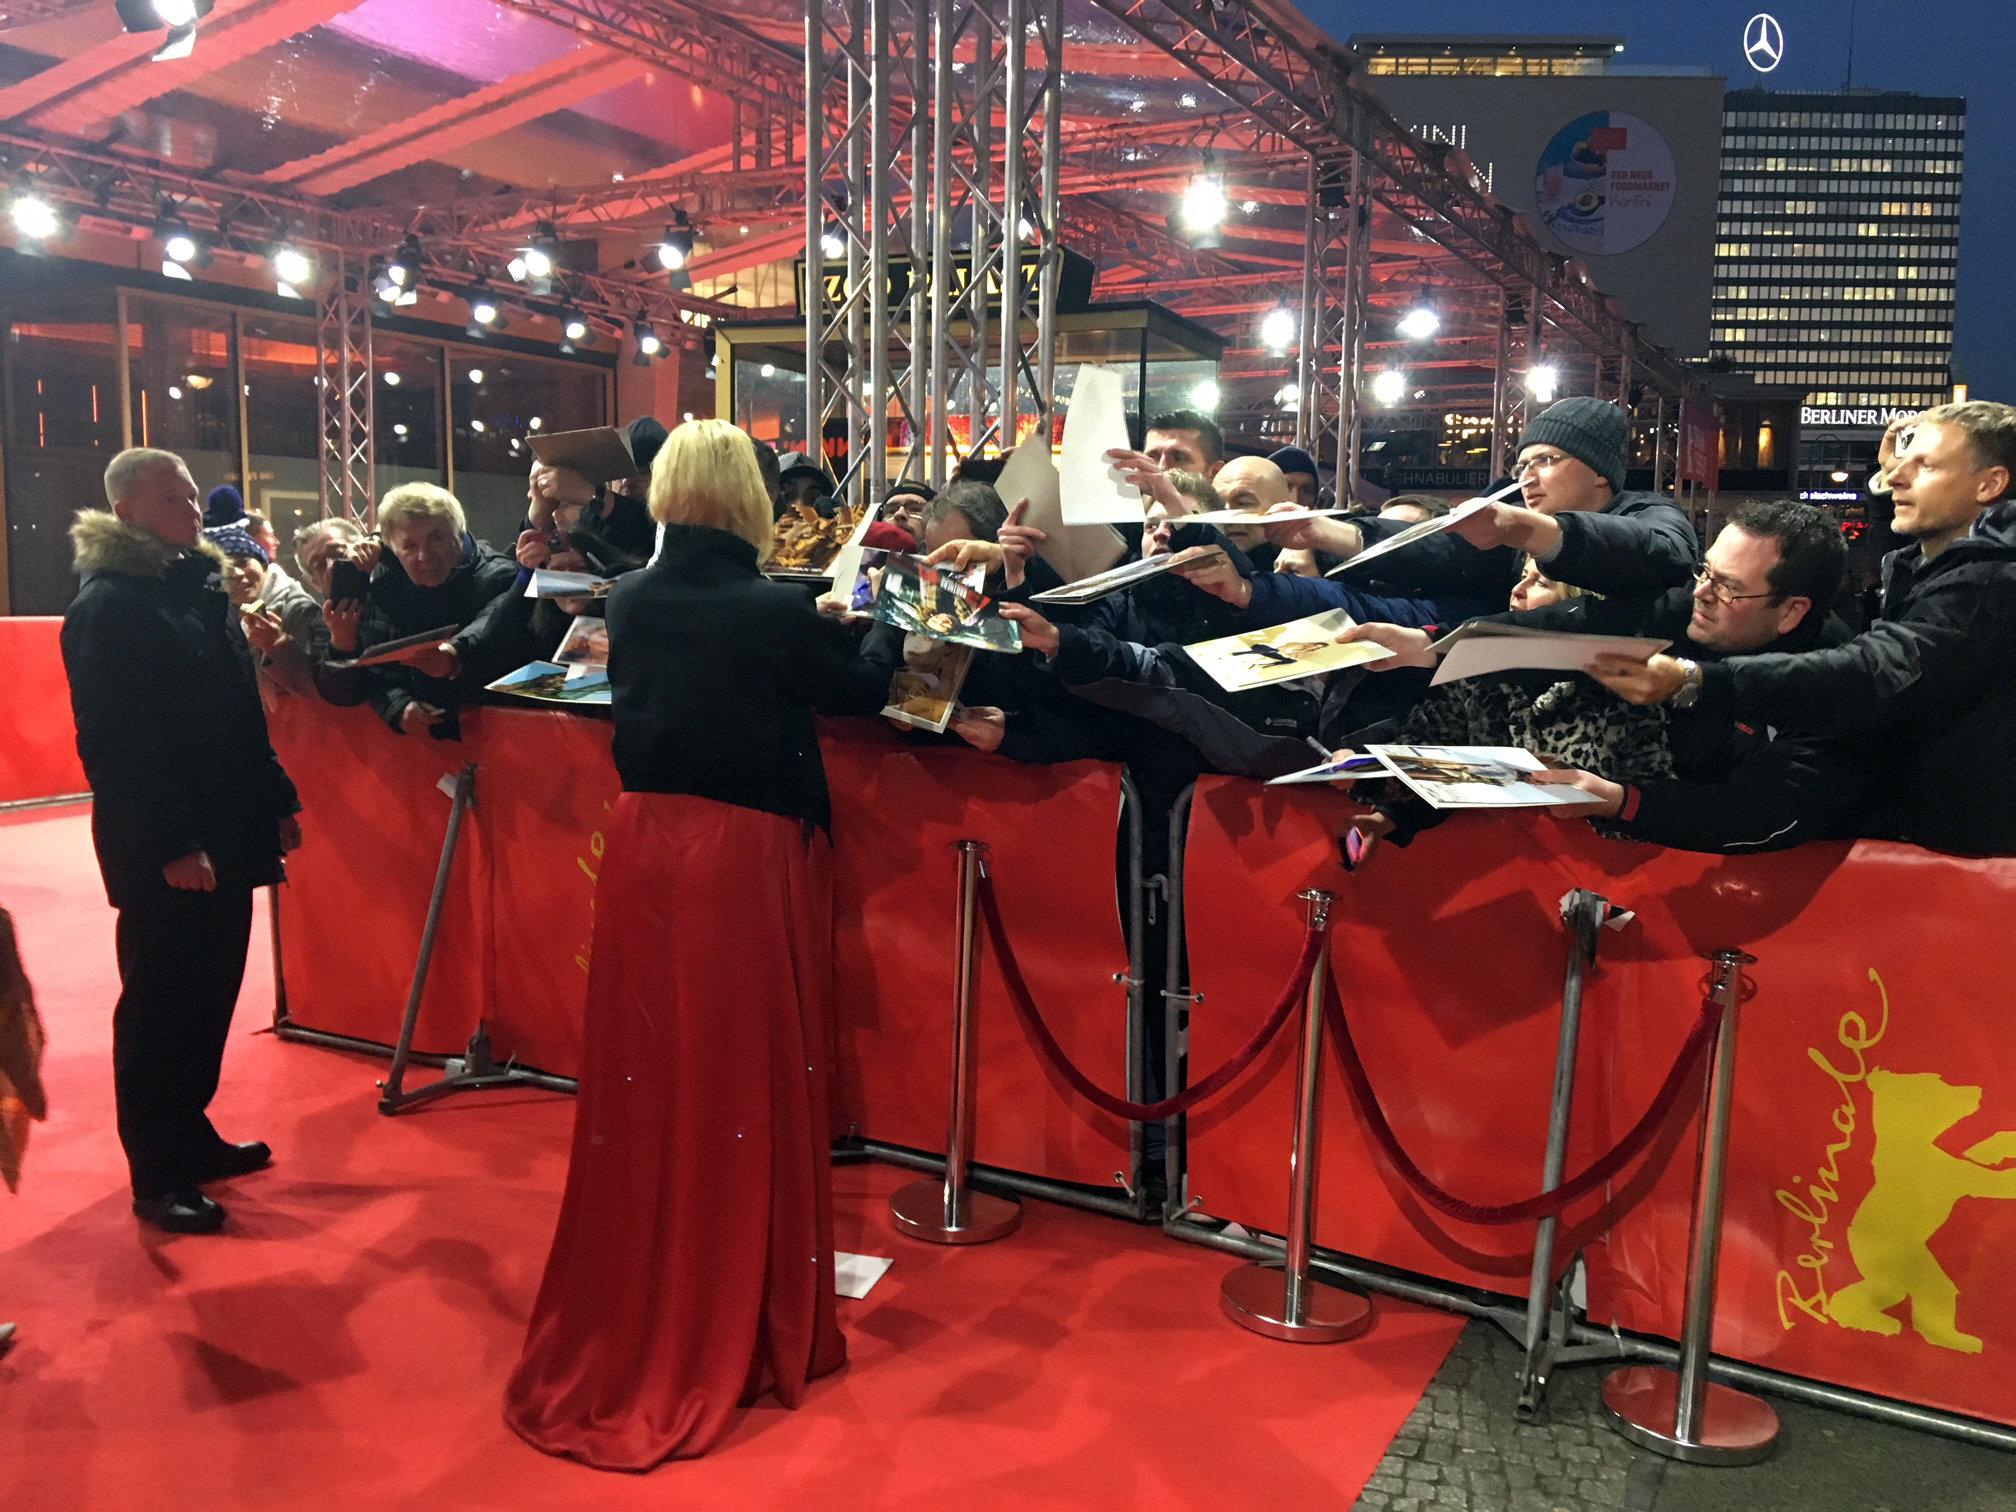 Connie Nielsen am Roten Teppich, Berlinale 2018  (Foto Michael Brake)